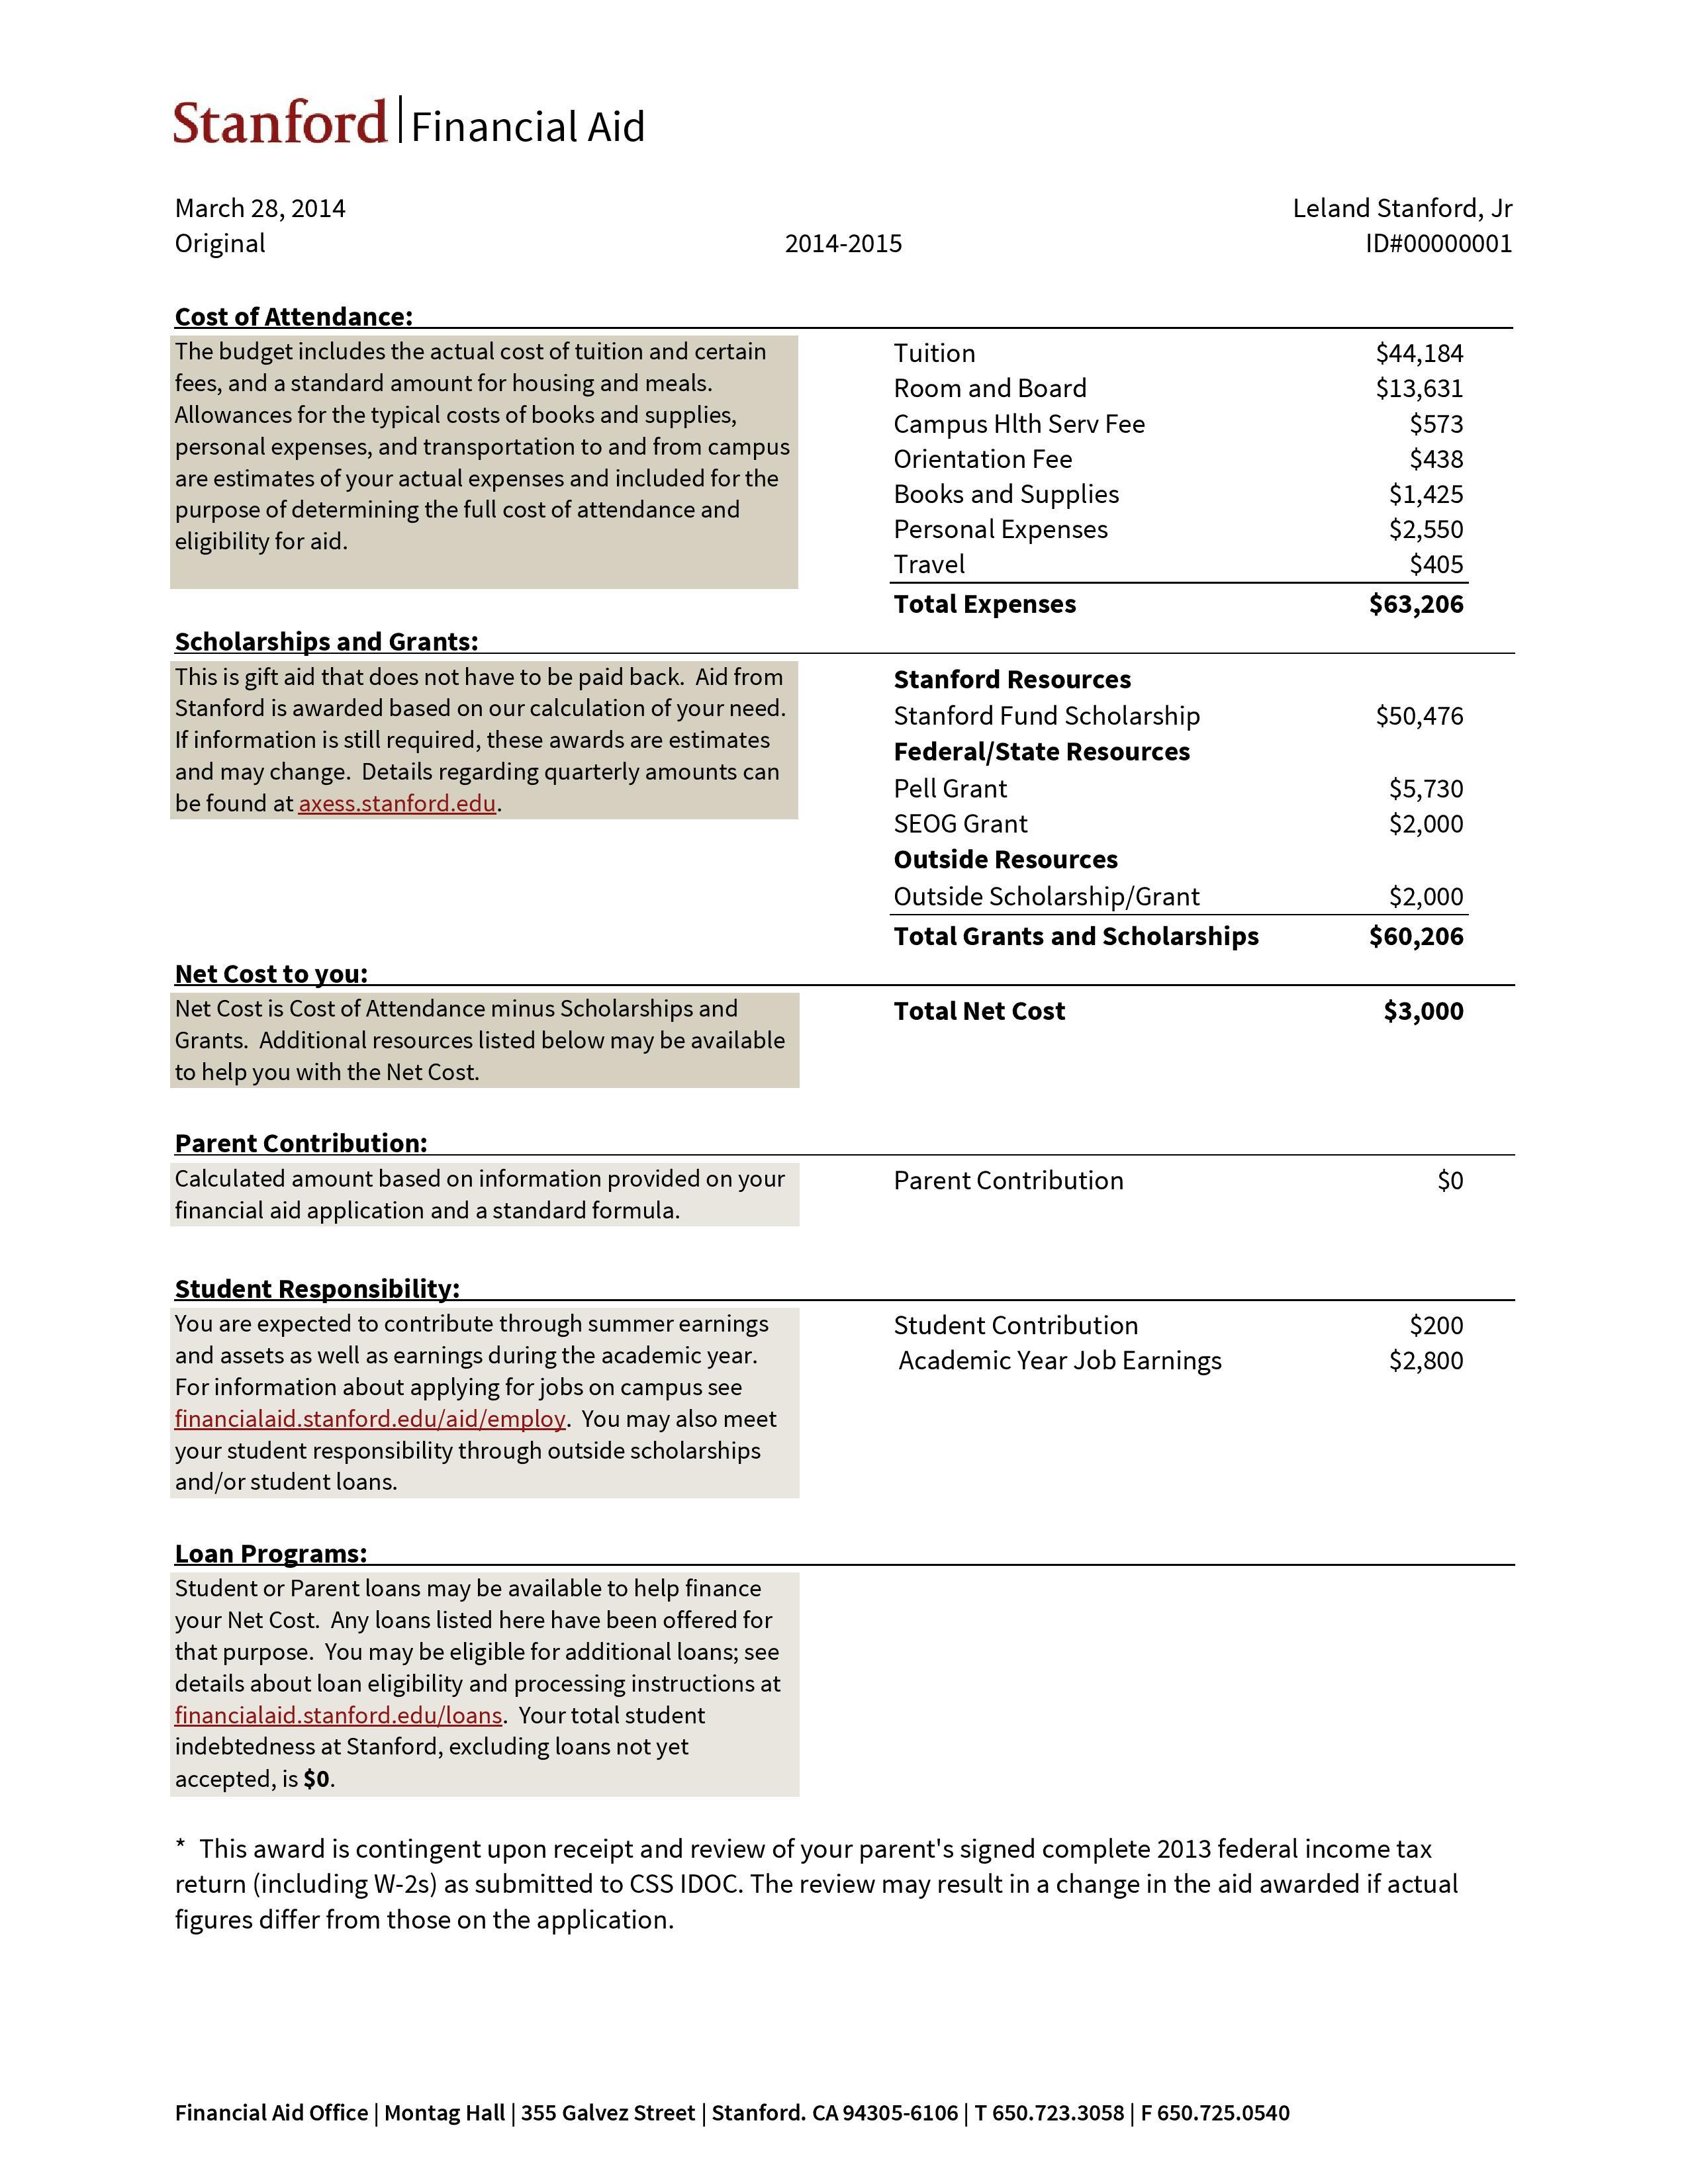 Sample Financial Aid Application